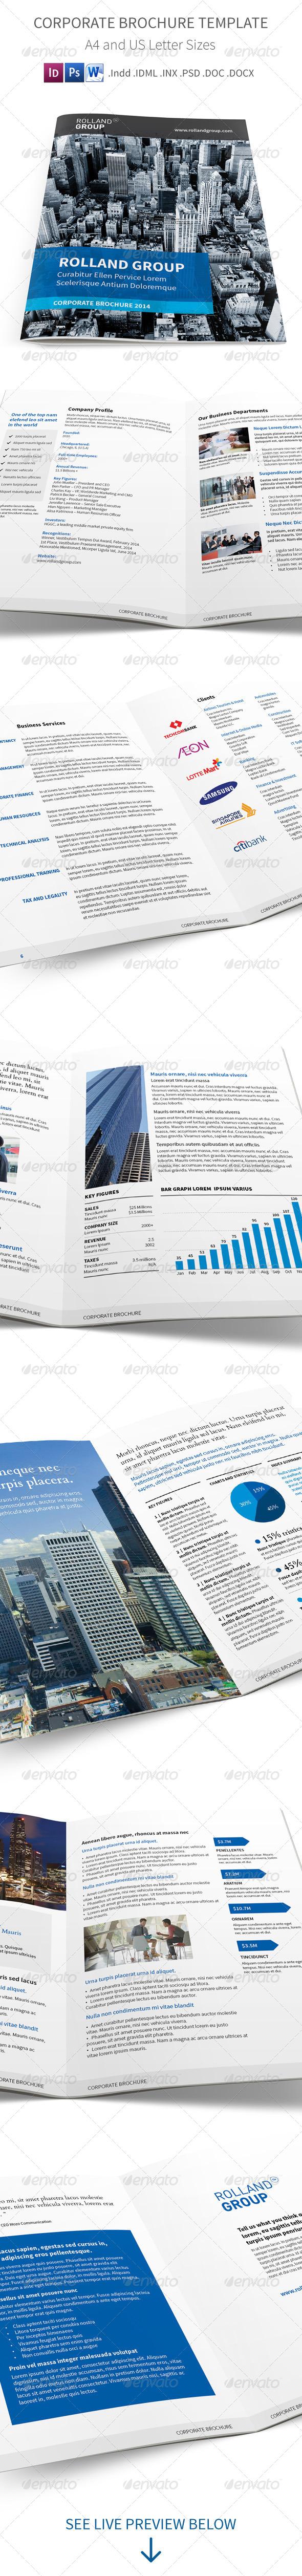 GraphicRiver Corporate Brochure Template 7932078